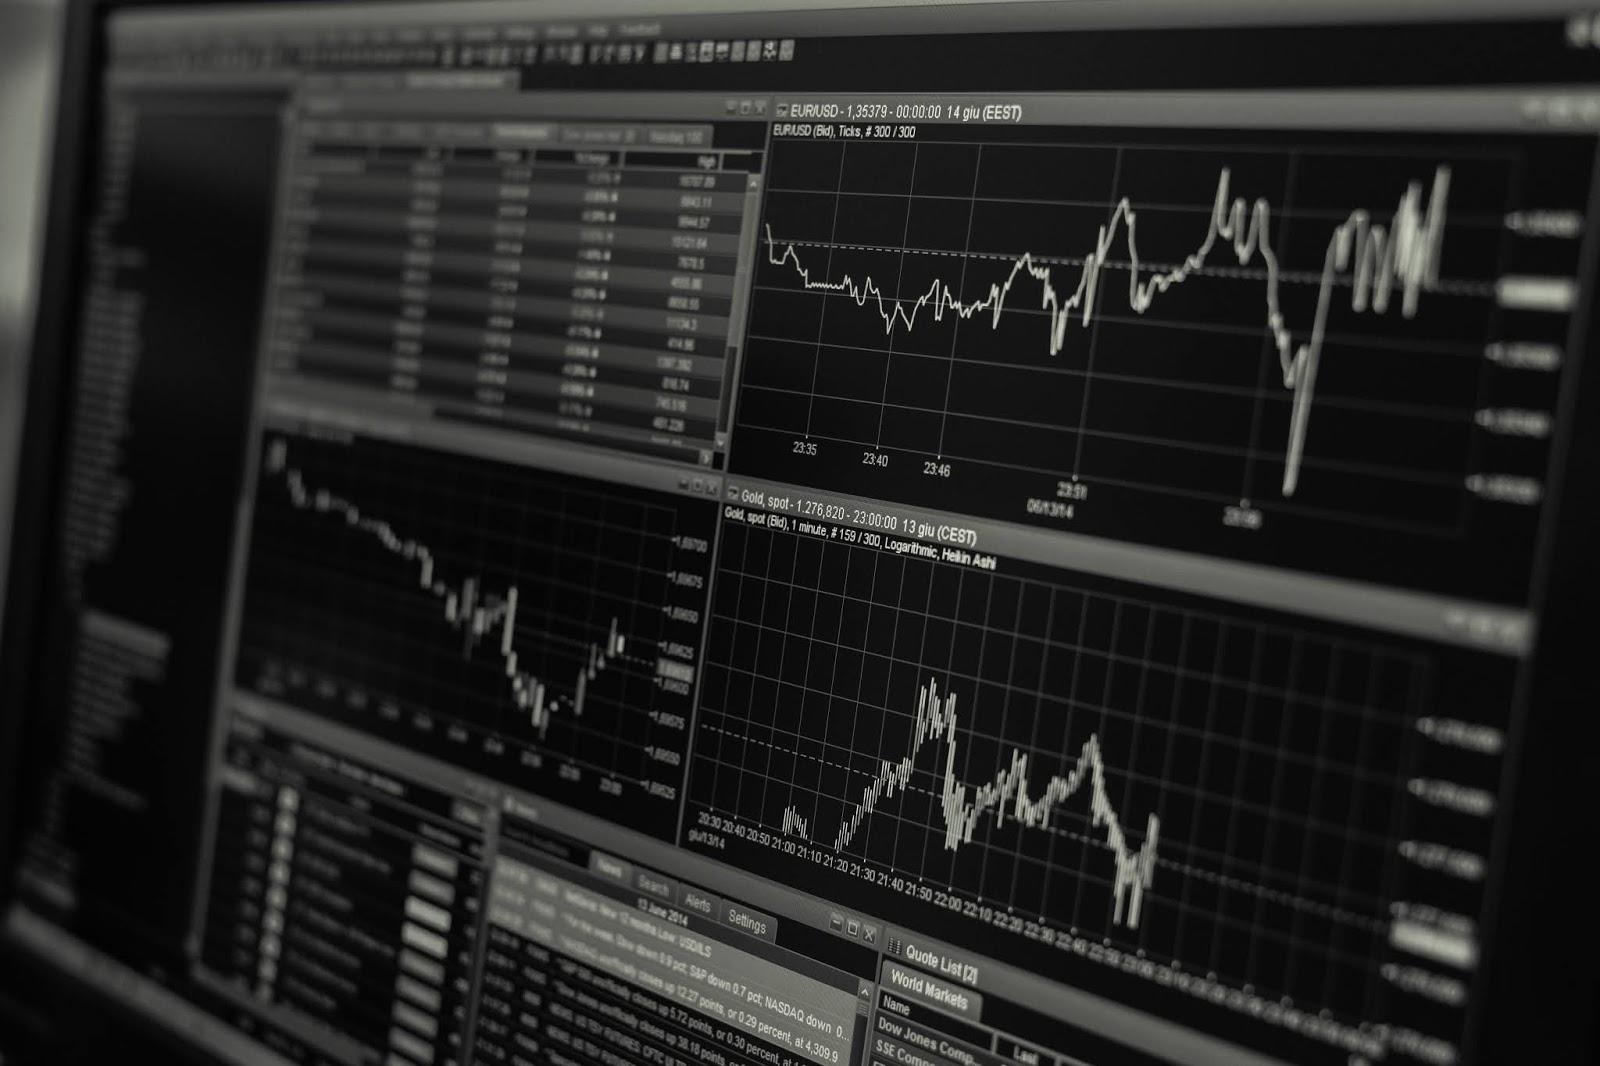 Форекс прогноз основных валютных пар на 15 апреля